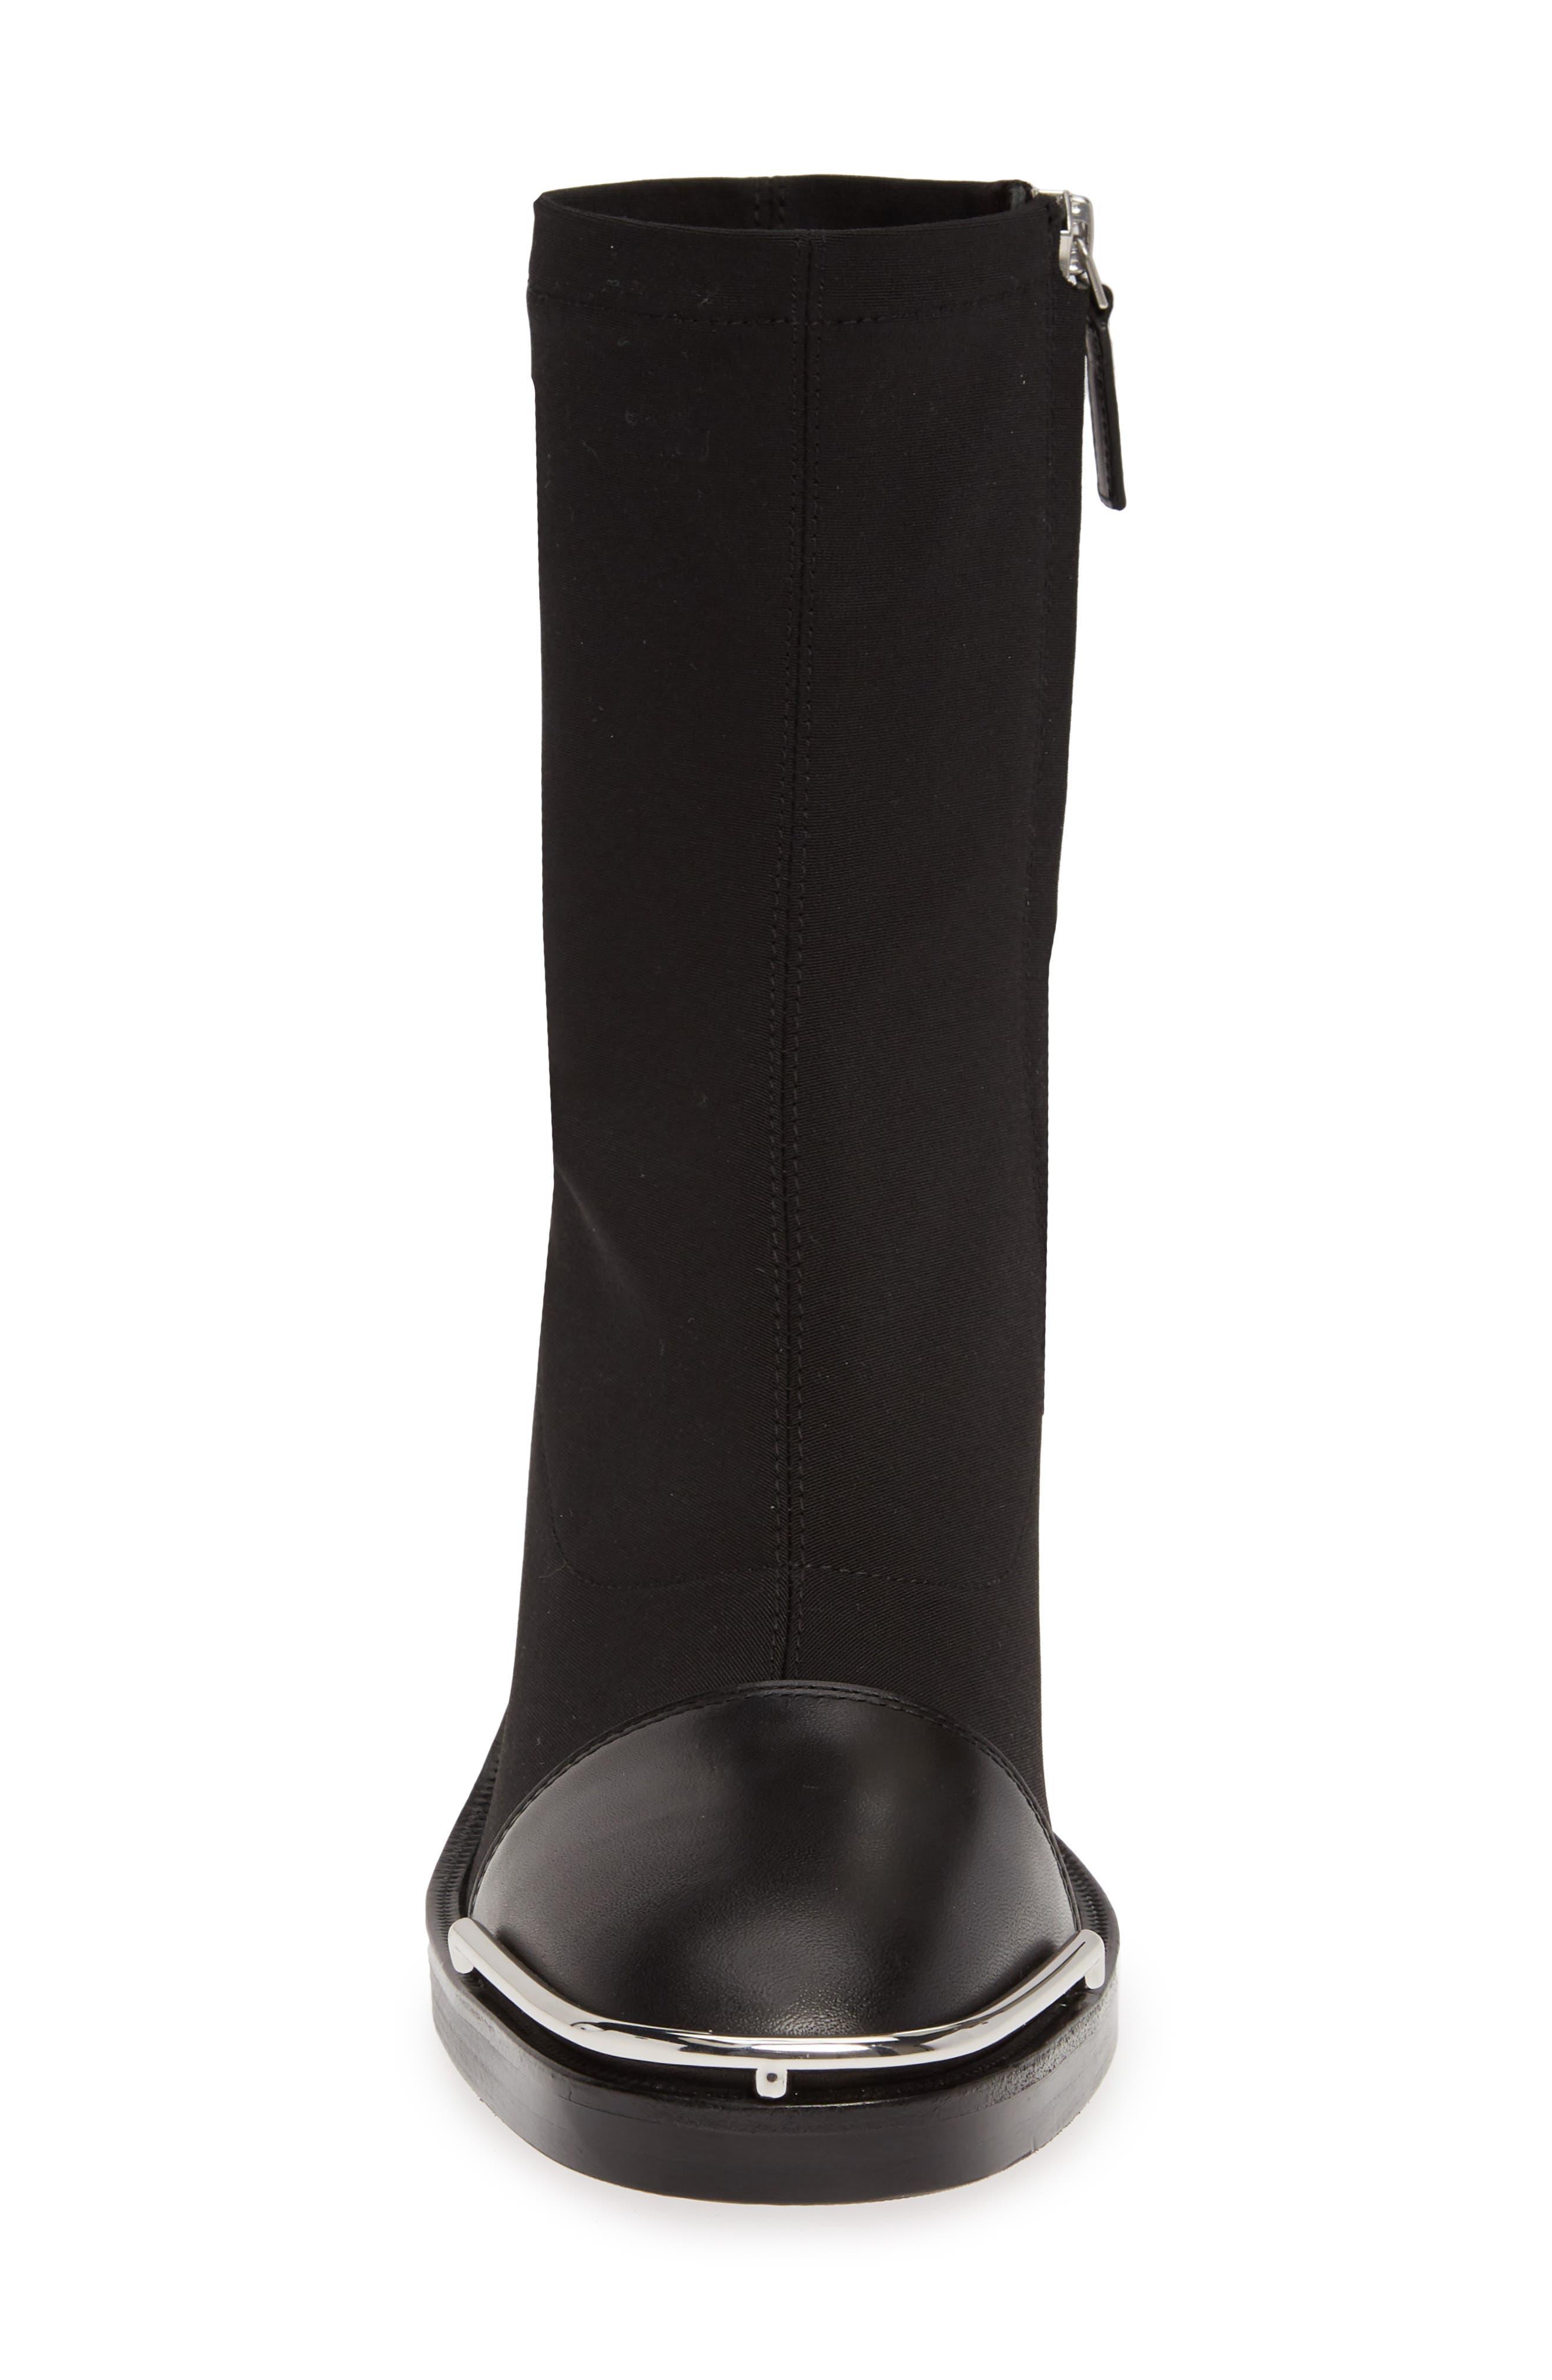 ALEXANDER WANG, Hailey Halo Sock Bootie, Alternate thumbnail 4, color, BLACK